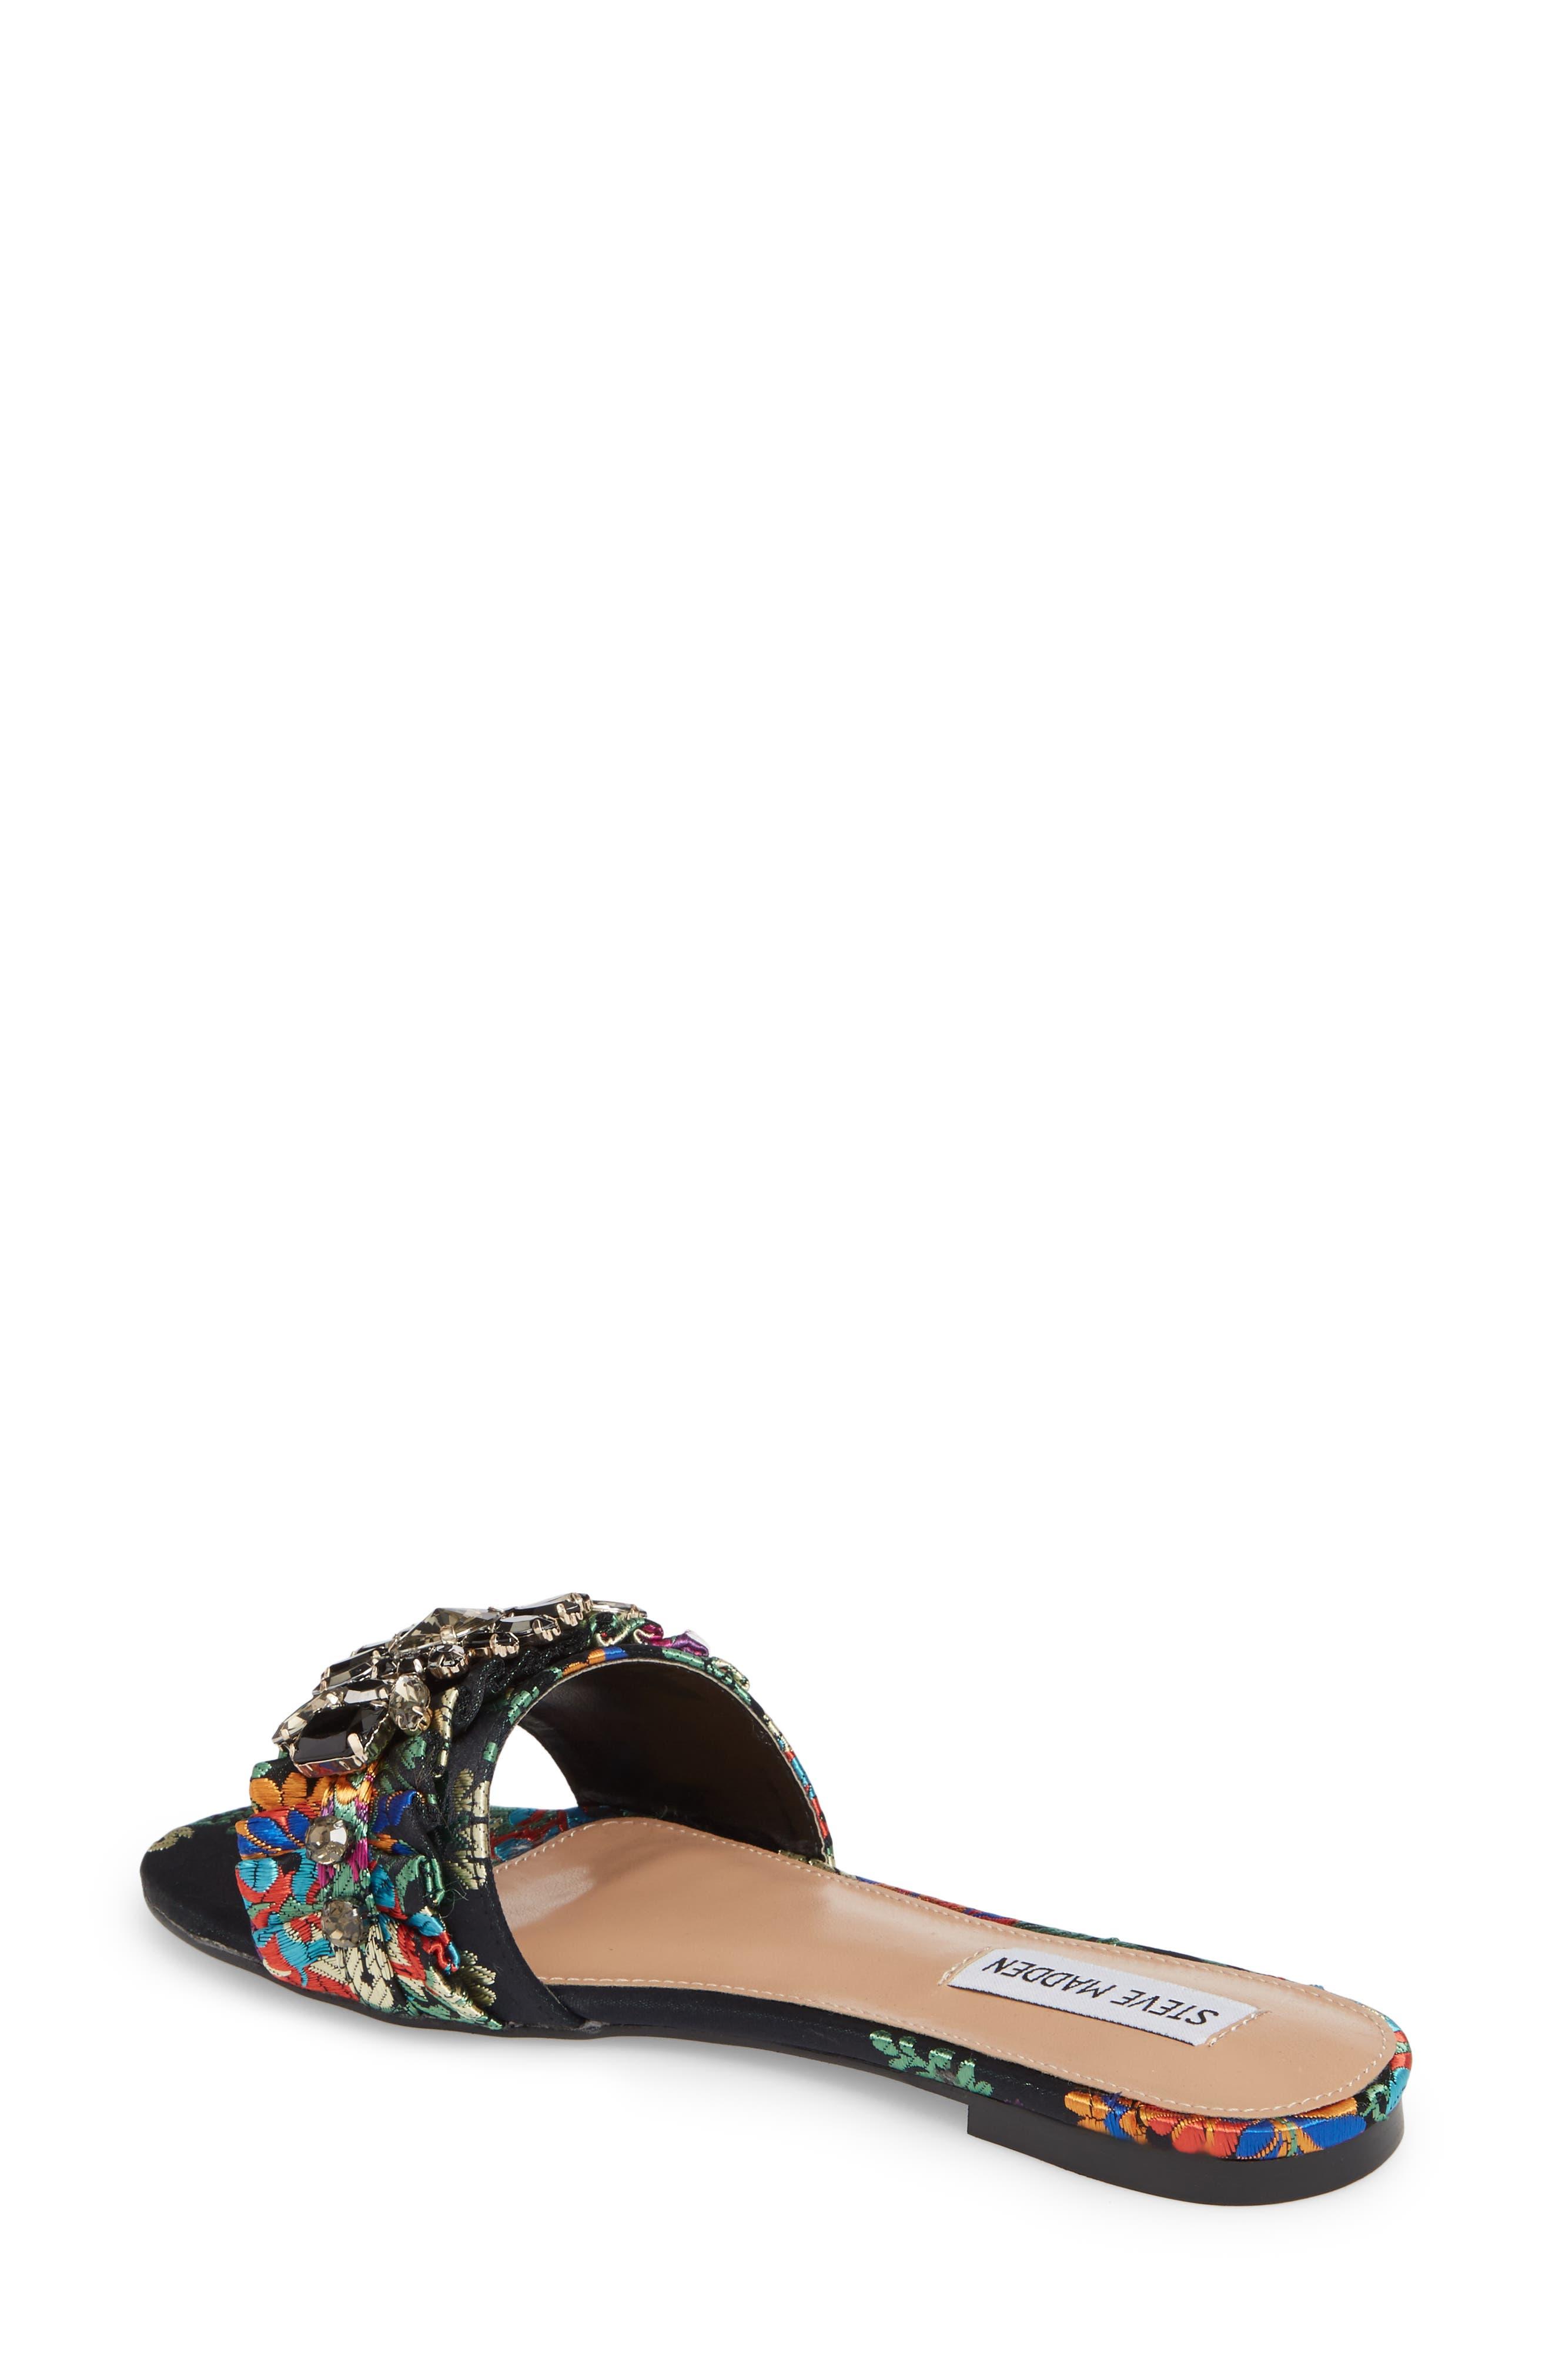 Pomona Crystal Embellished Slide Sandal,                             Alternate thumbnail 2, color,                             Black Multi